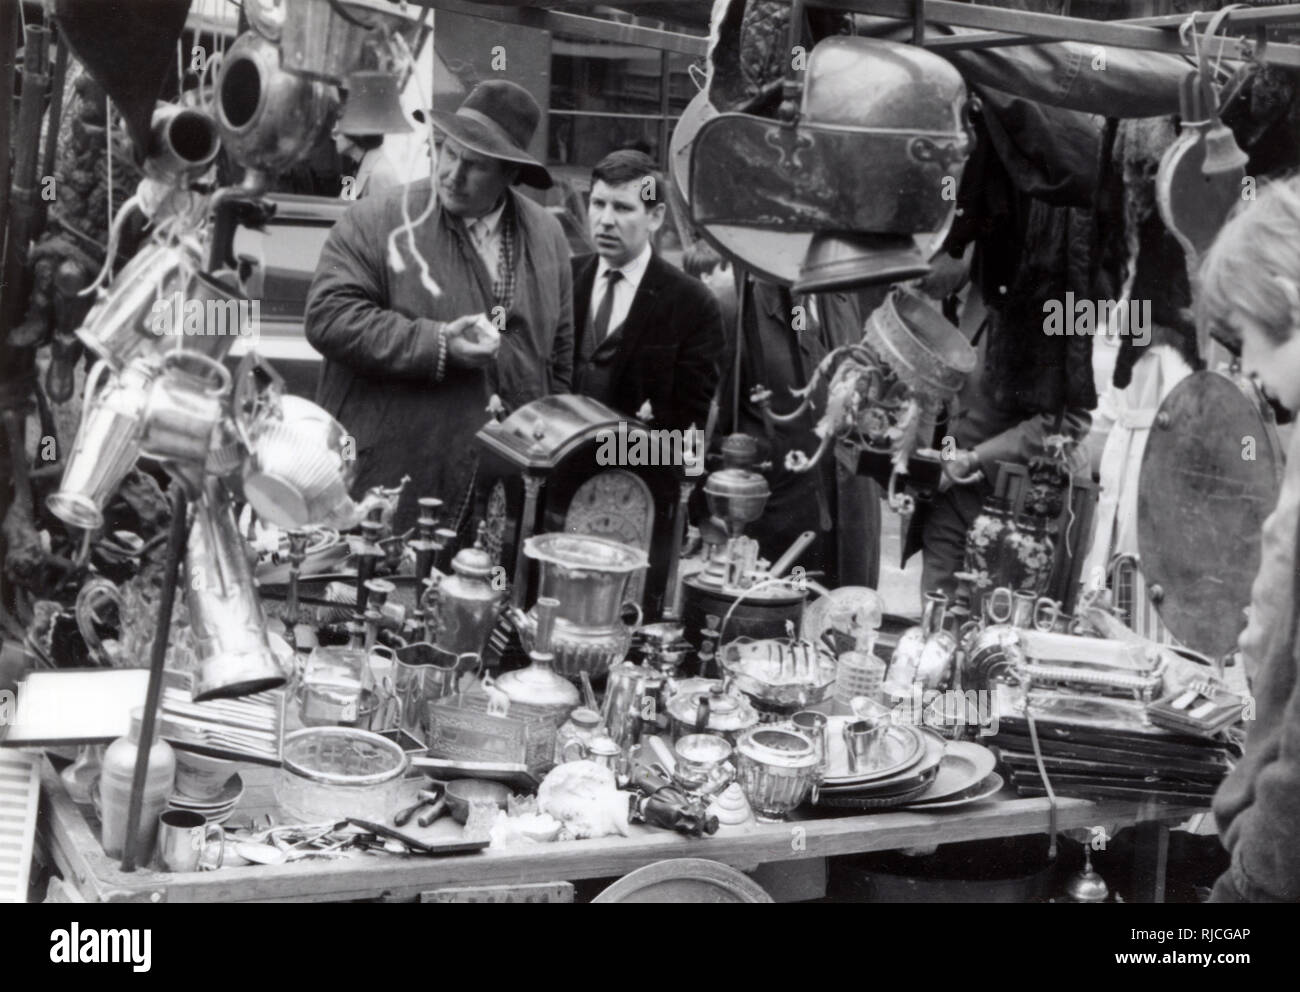 Portobello Road Market - Bric a Brac Stall. Stock Photo